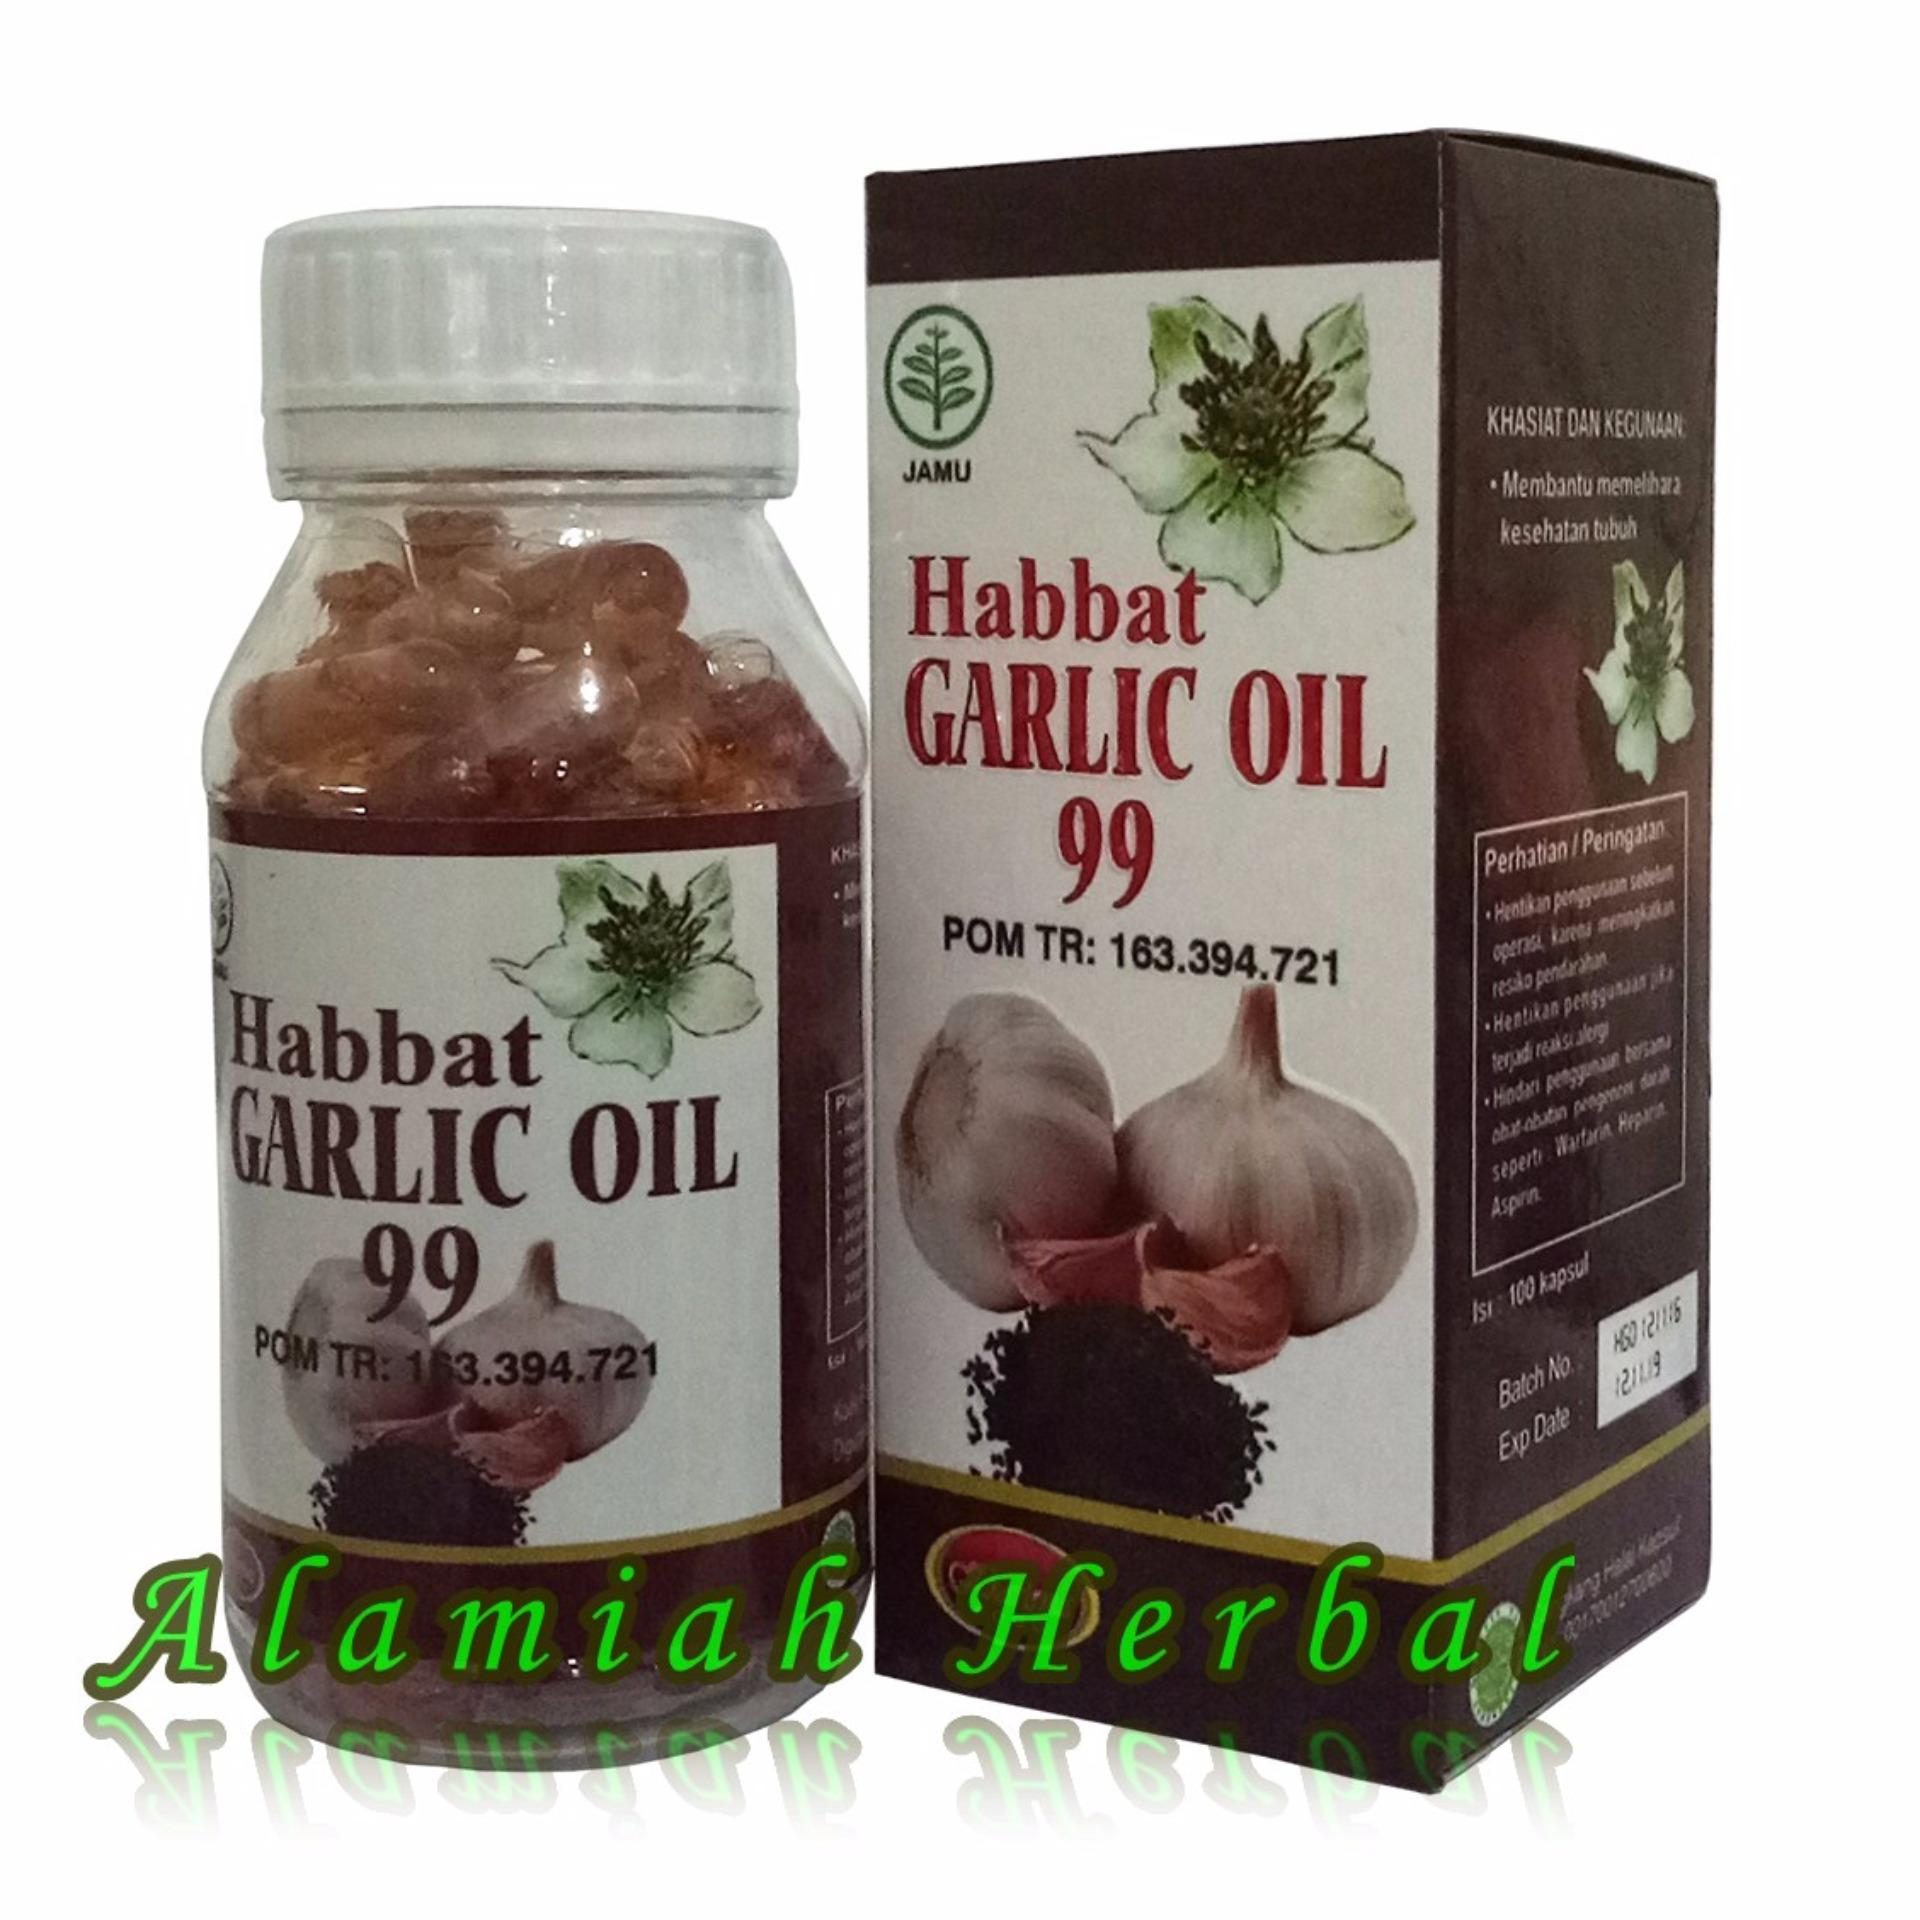 Toko Kharisma Habba Garlic Oil 99 100 Kapsul Terdekat